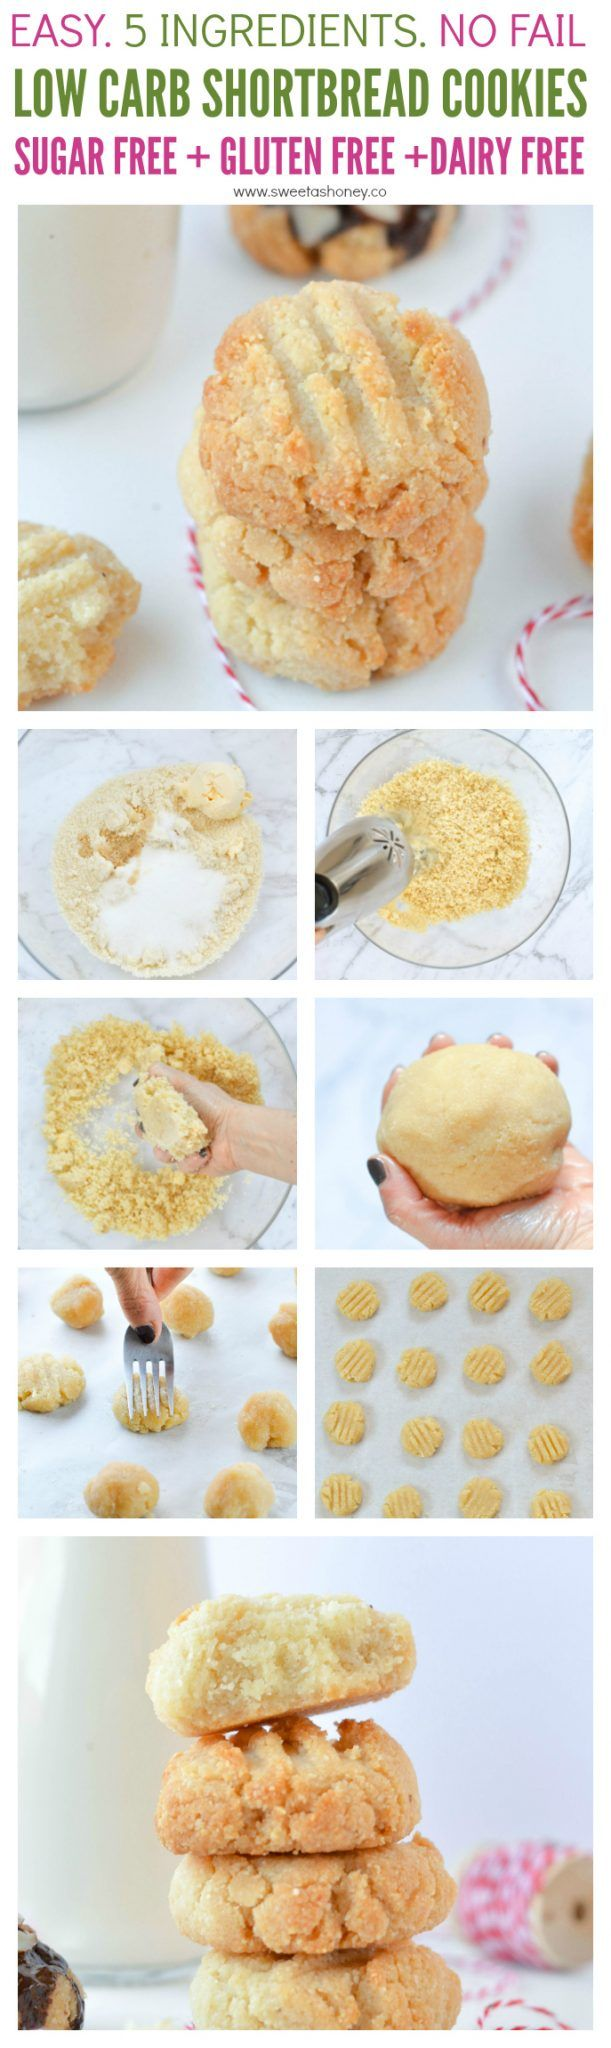 Low carb shortbread cookies – Vegan + Gluten free